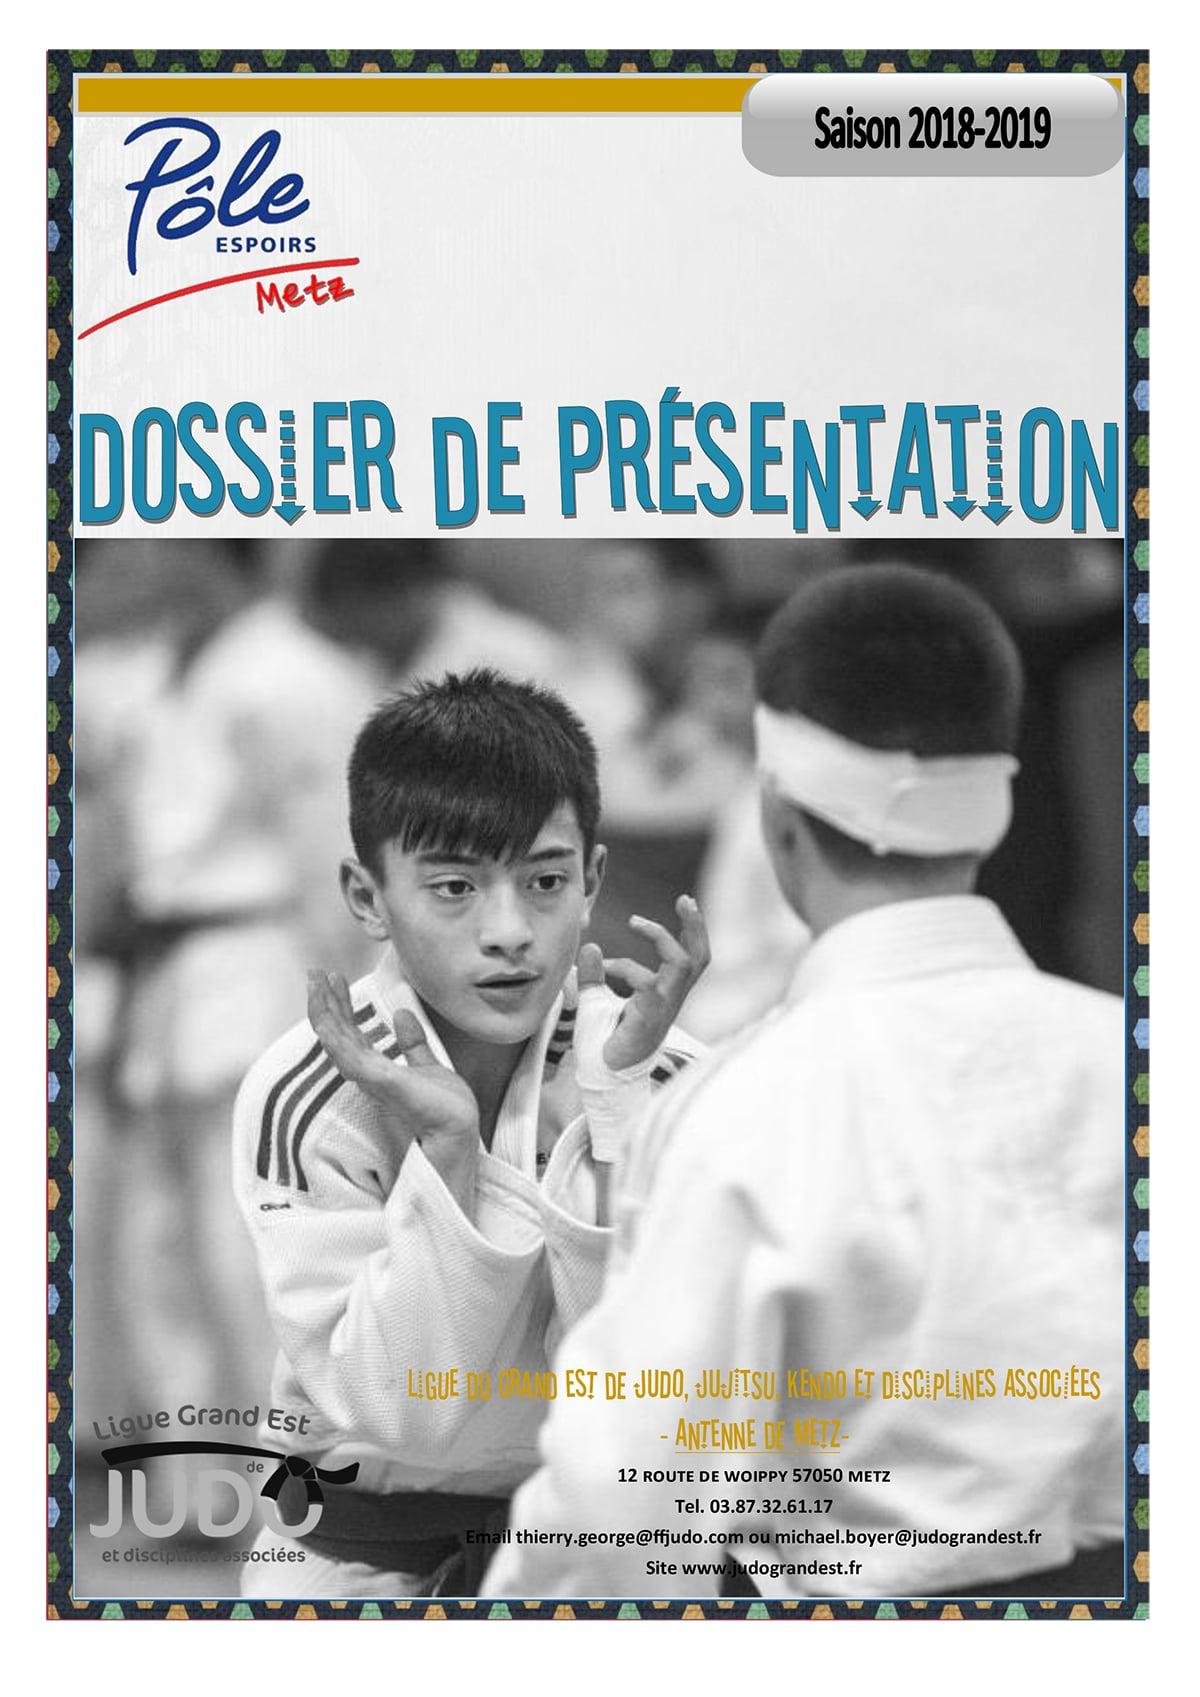 pe_metz_presentation